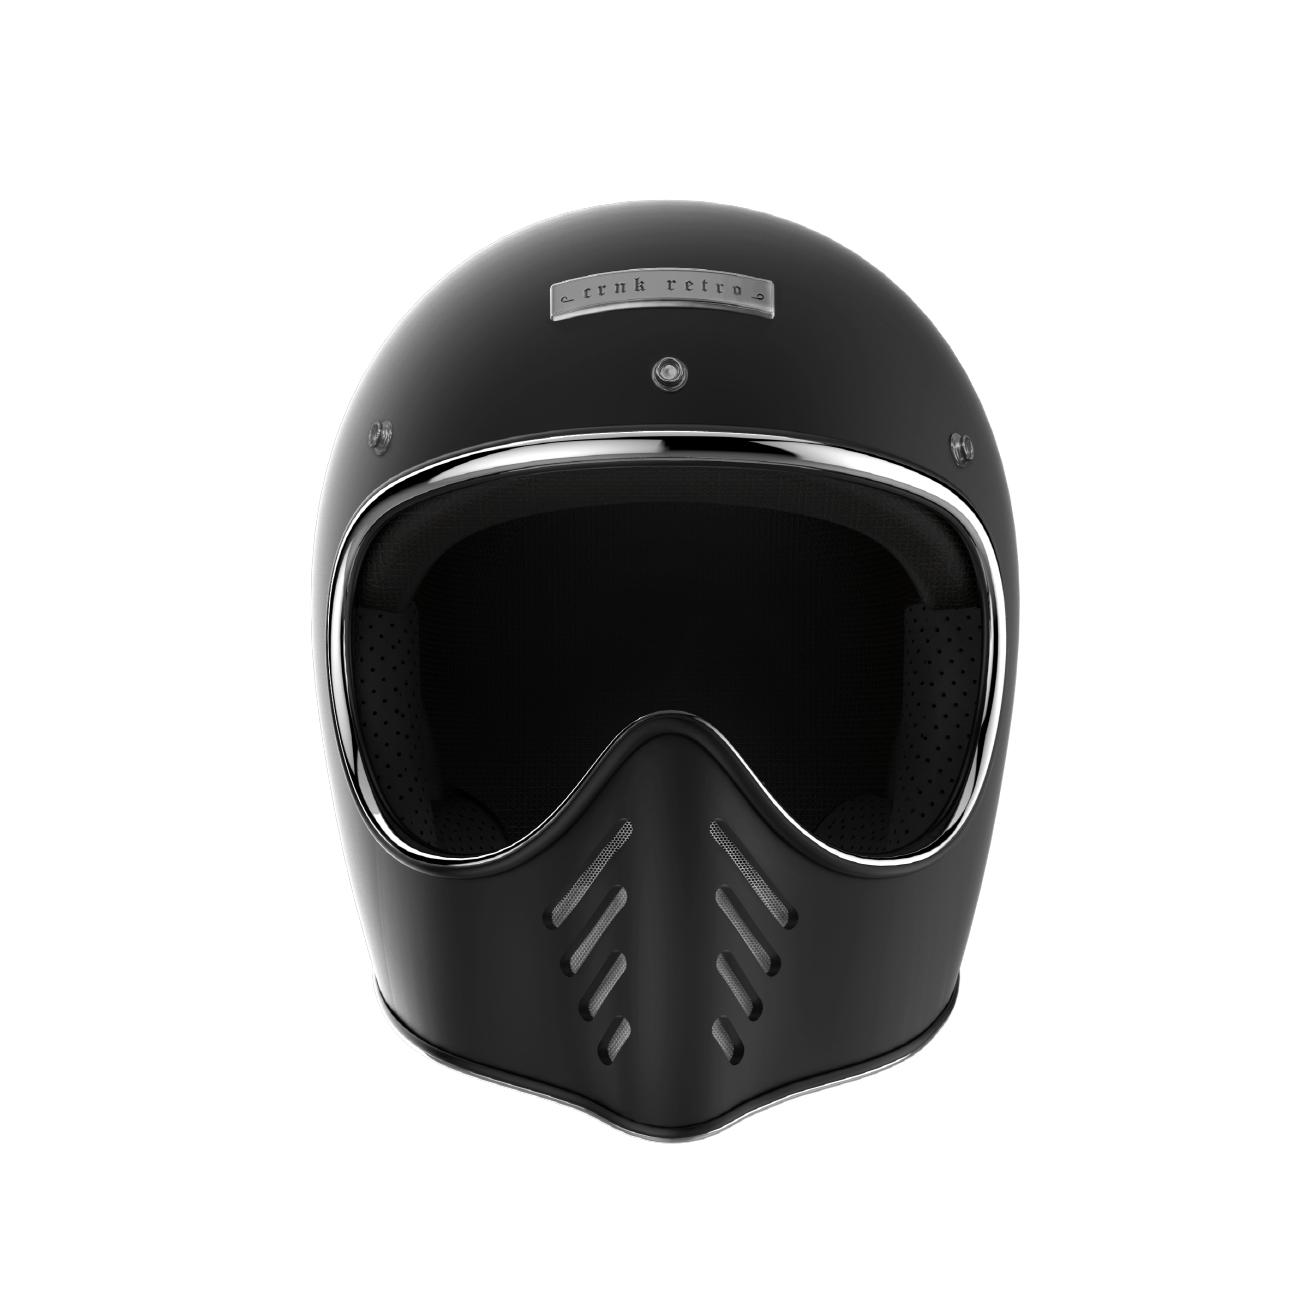 CRNK RETRO 오토바이 풀페이스 헬멧, Black